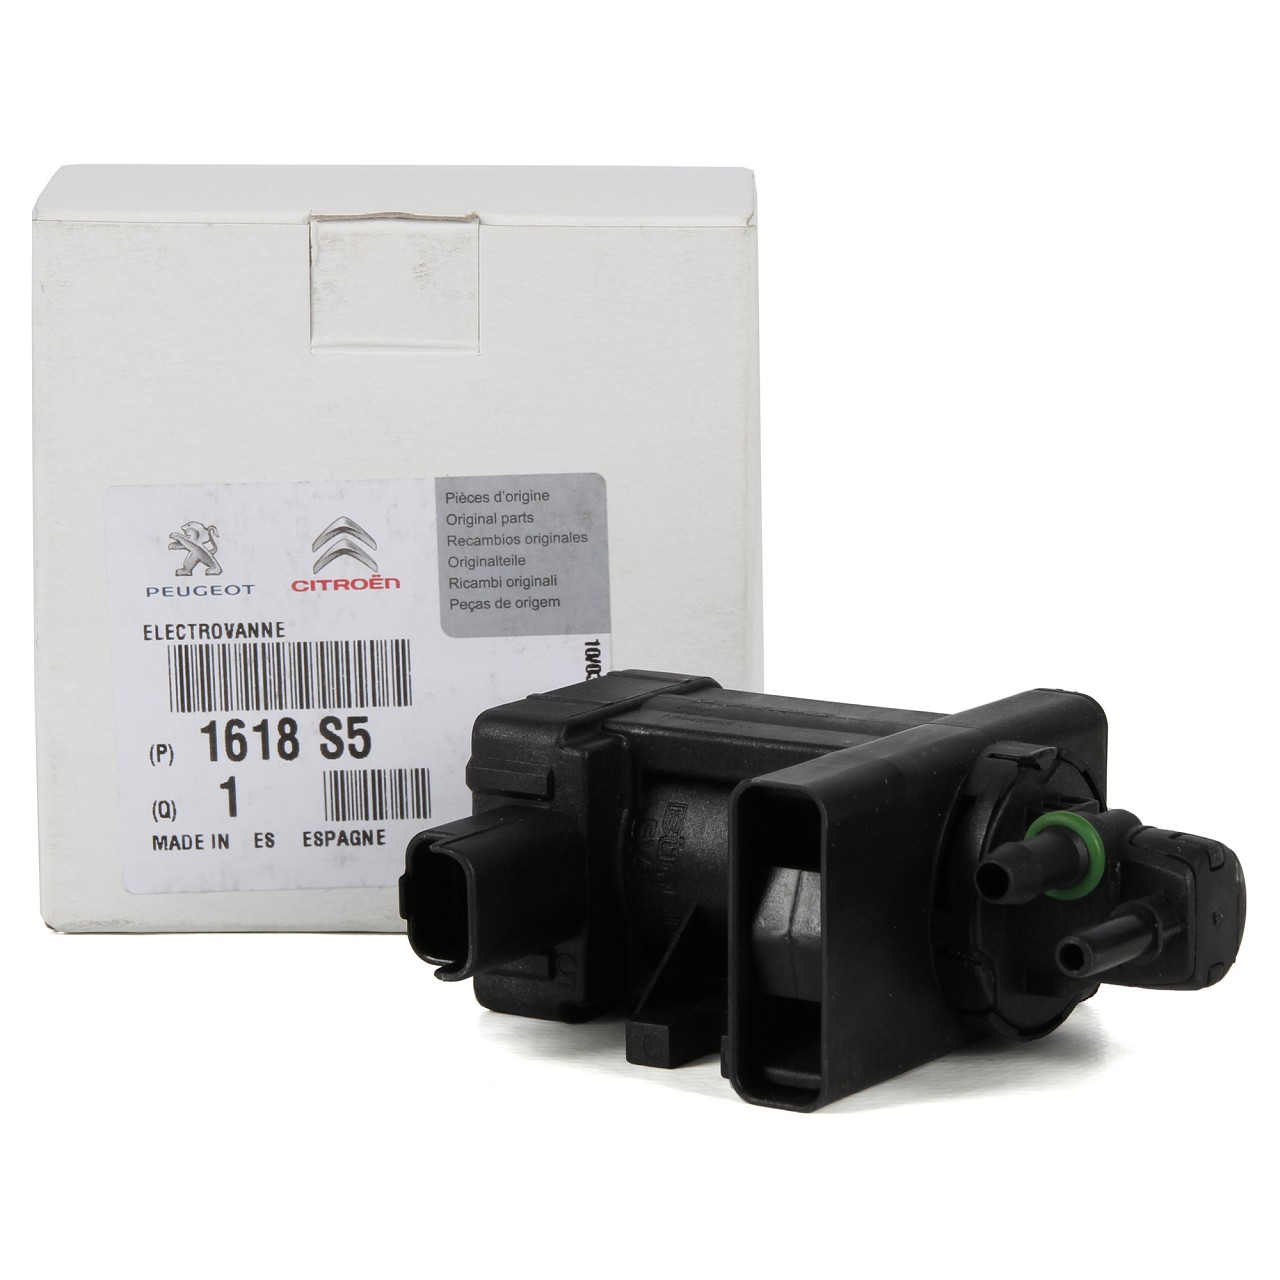 ORIGINAL Citroen Peugeot Druckwandler Magnetventil Elektroventil 2.0 HDi 1618.S5